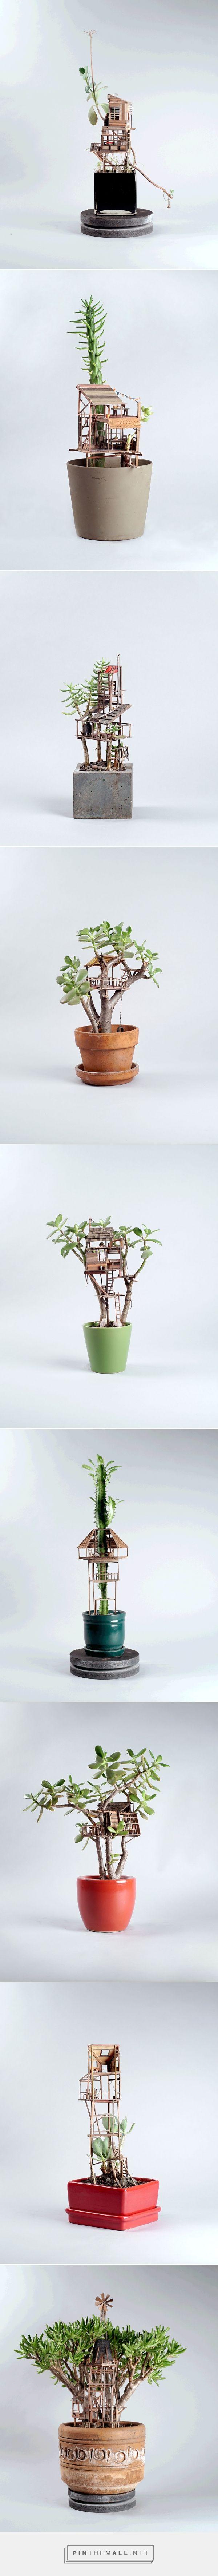 Miniature Treehouse Sculptures Built Around Houseplants by Jedediah Voltz